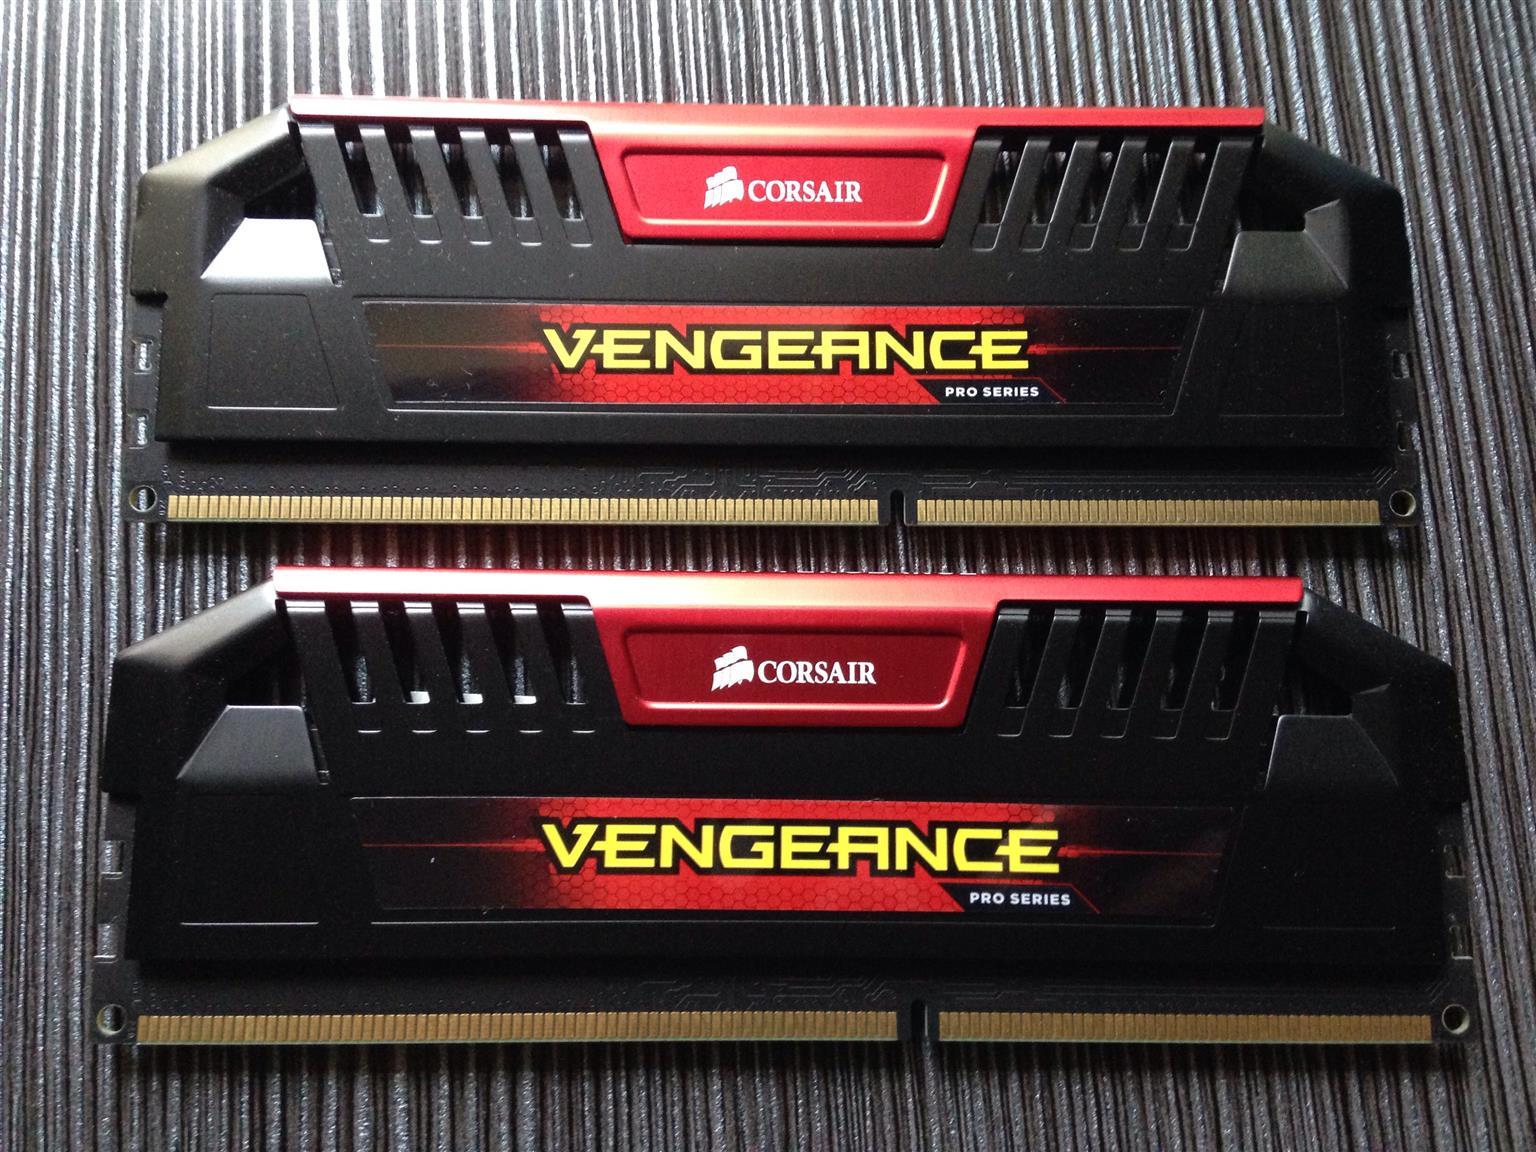 Corsair Vengeance Pro 8GB Kit